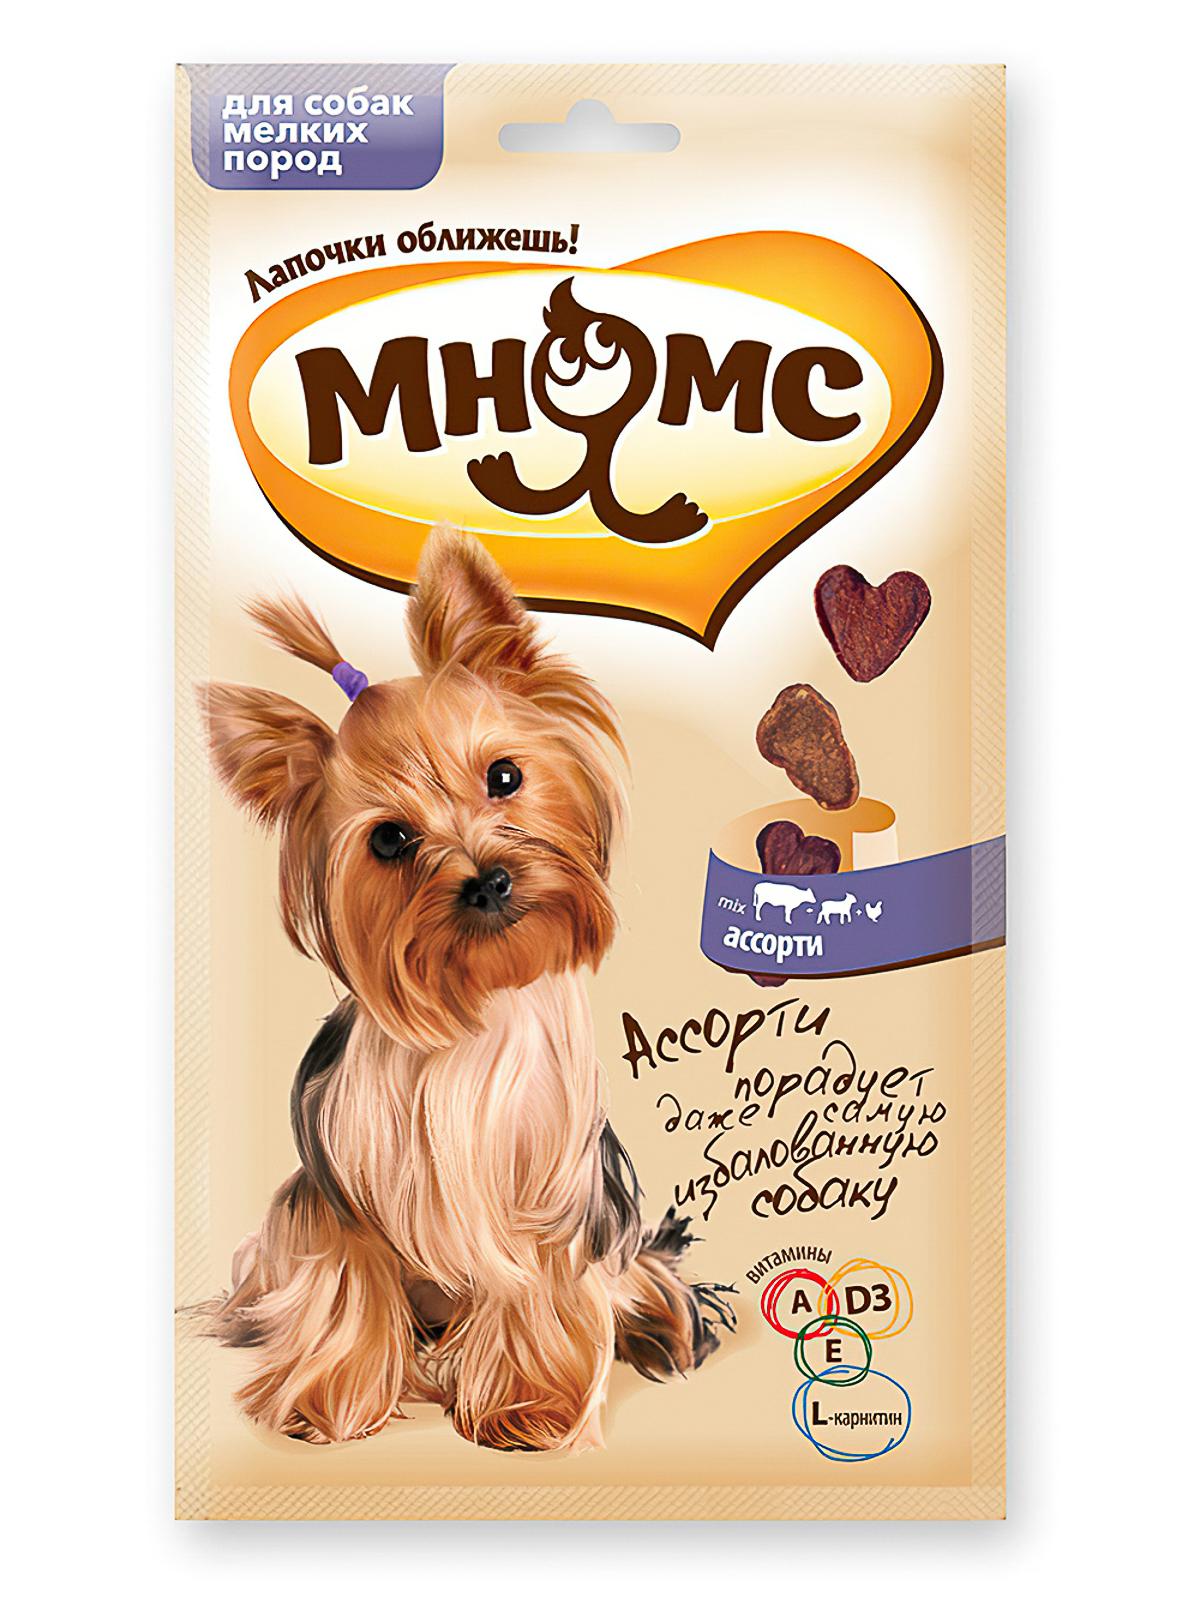 Мнямс Ассорти для собак мелких пород Мнямс говядина, ягненок, курица 700064_1.jpg